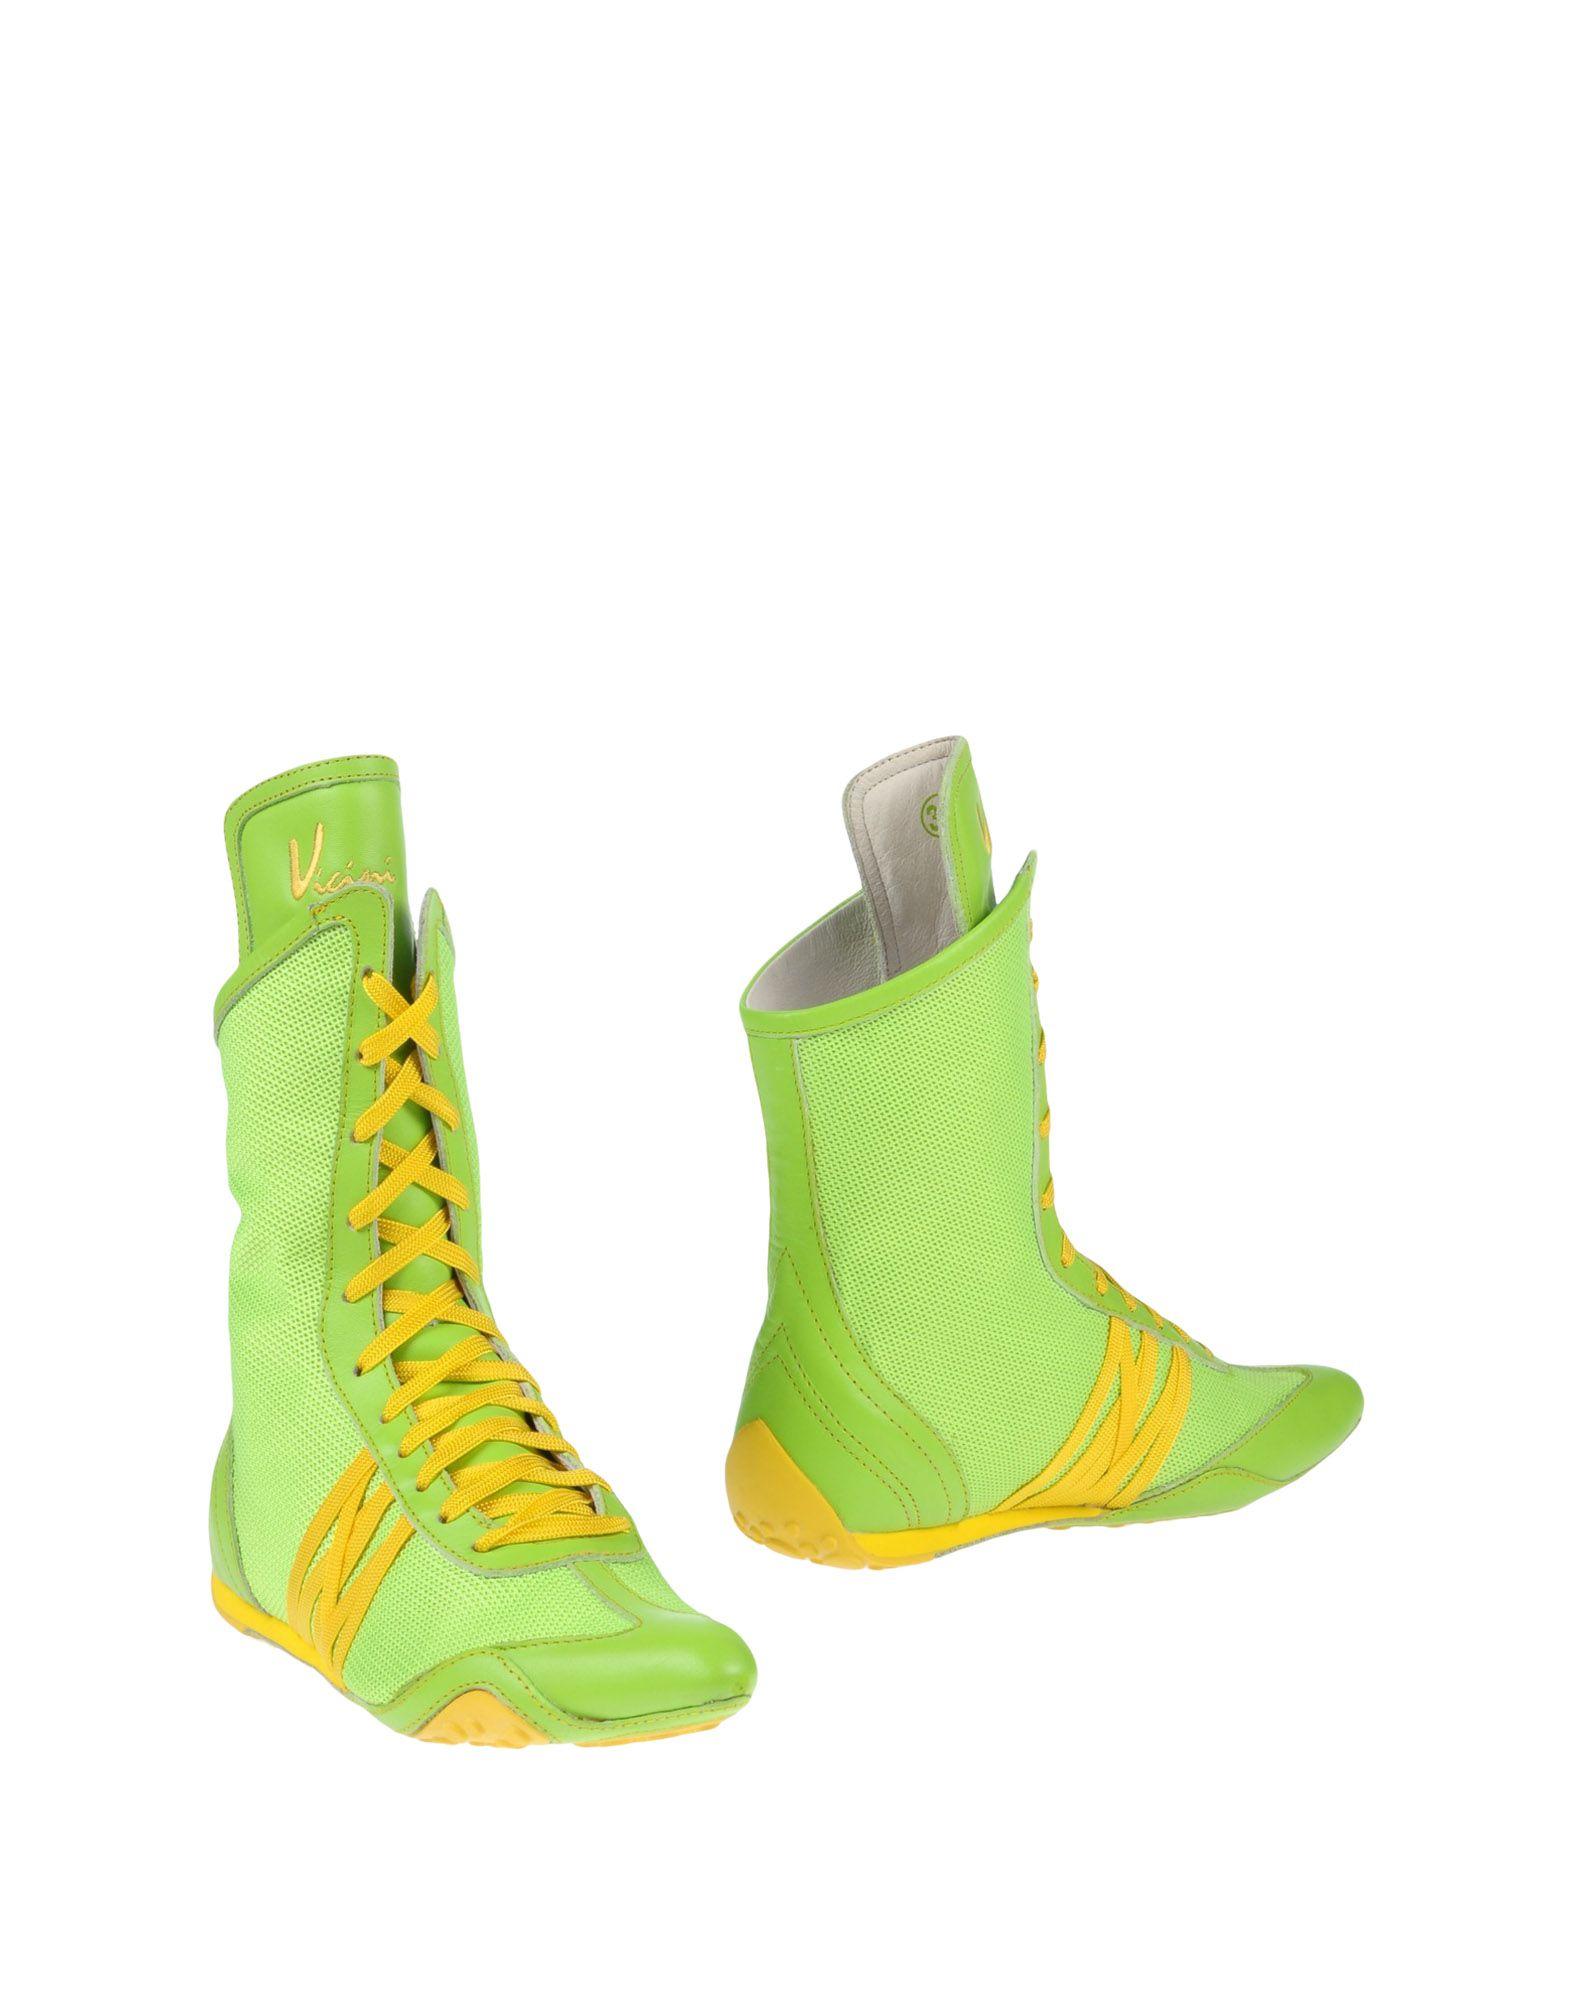 VICINI FASHION SPORT Полусапоги и высокие ботинки